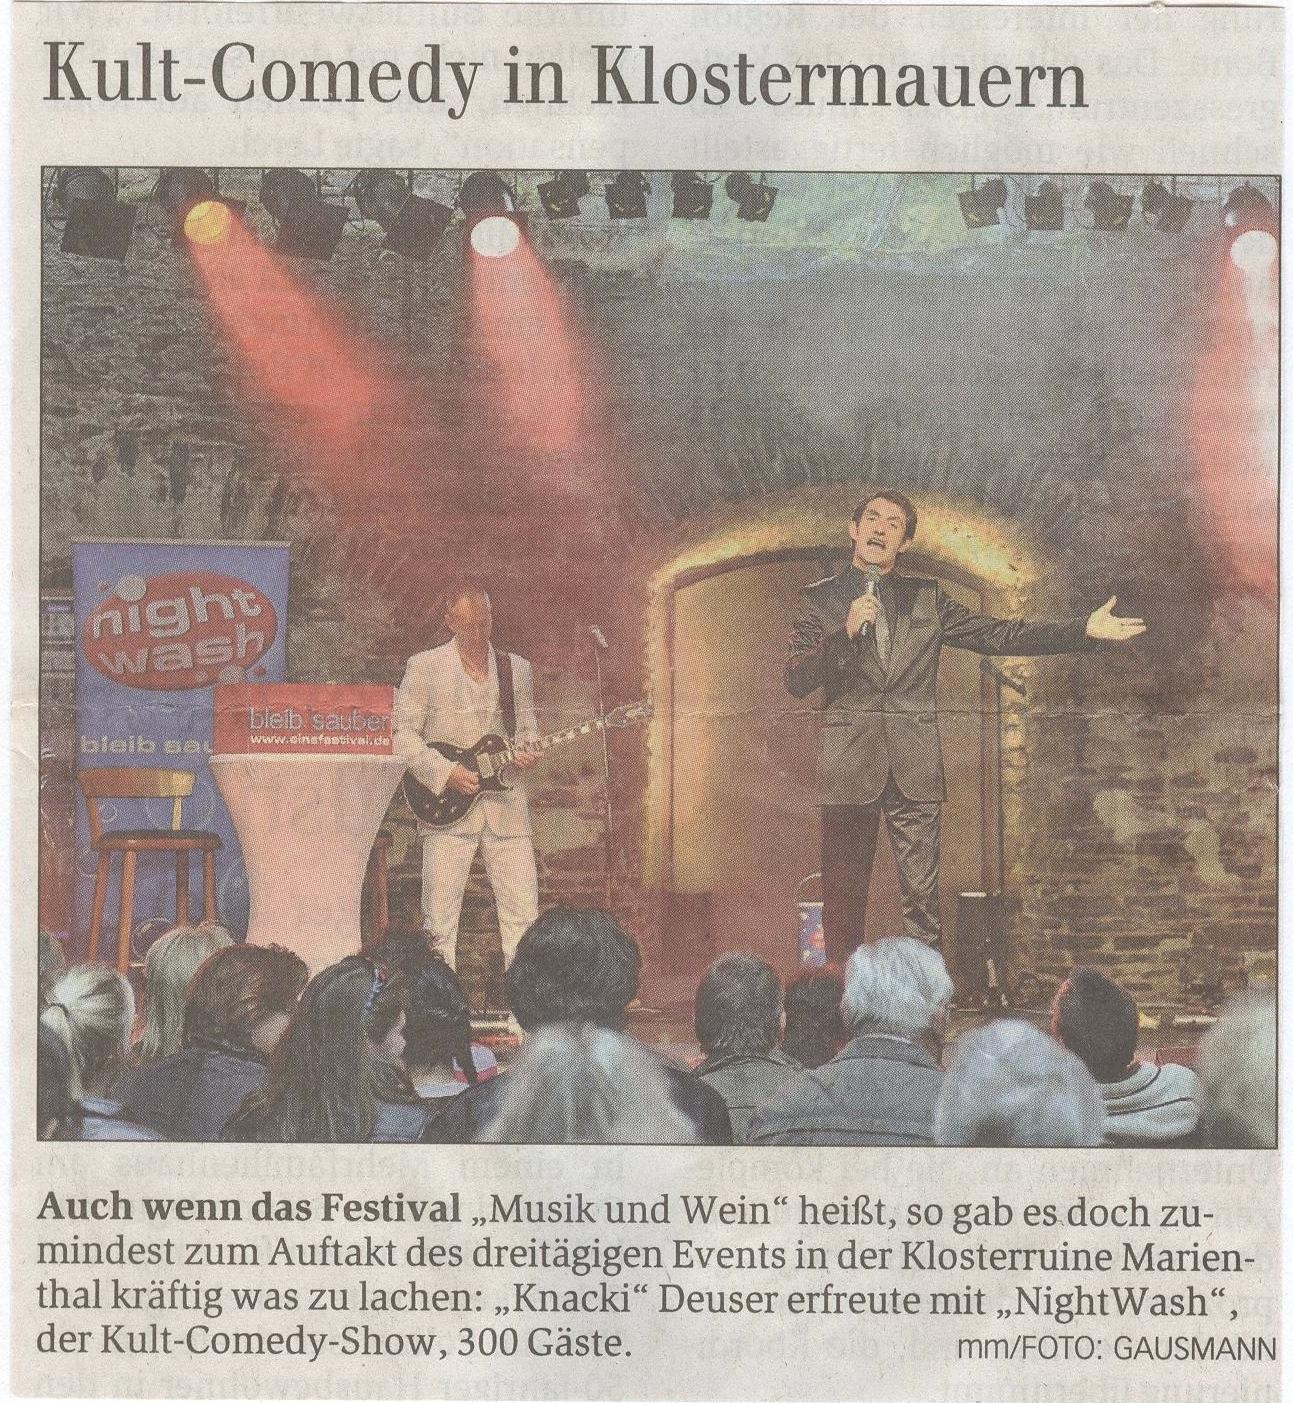 Kult Comedy in Klostermauern 2011 001